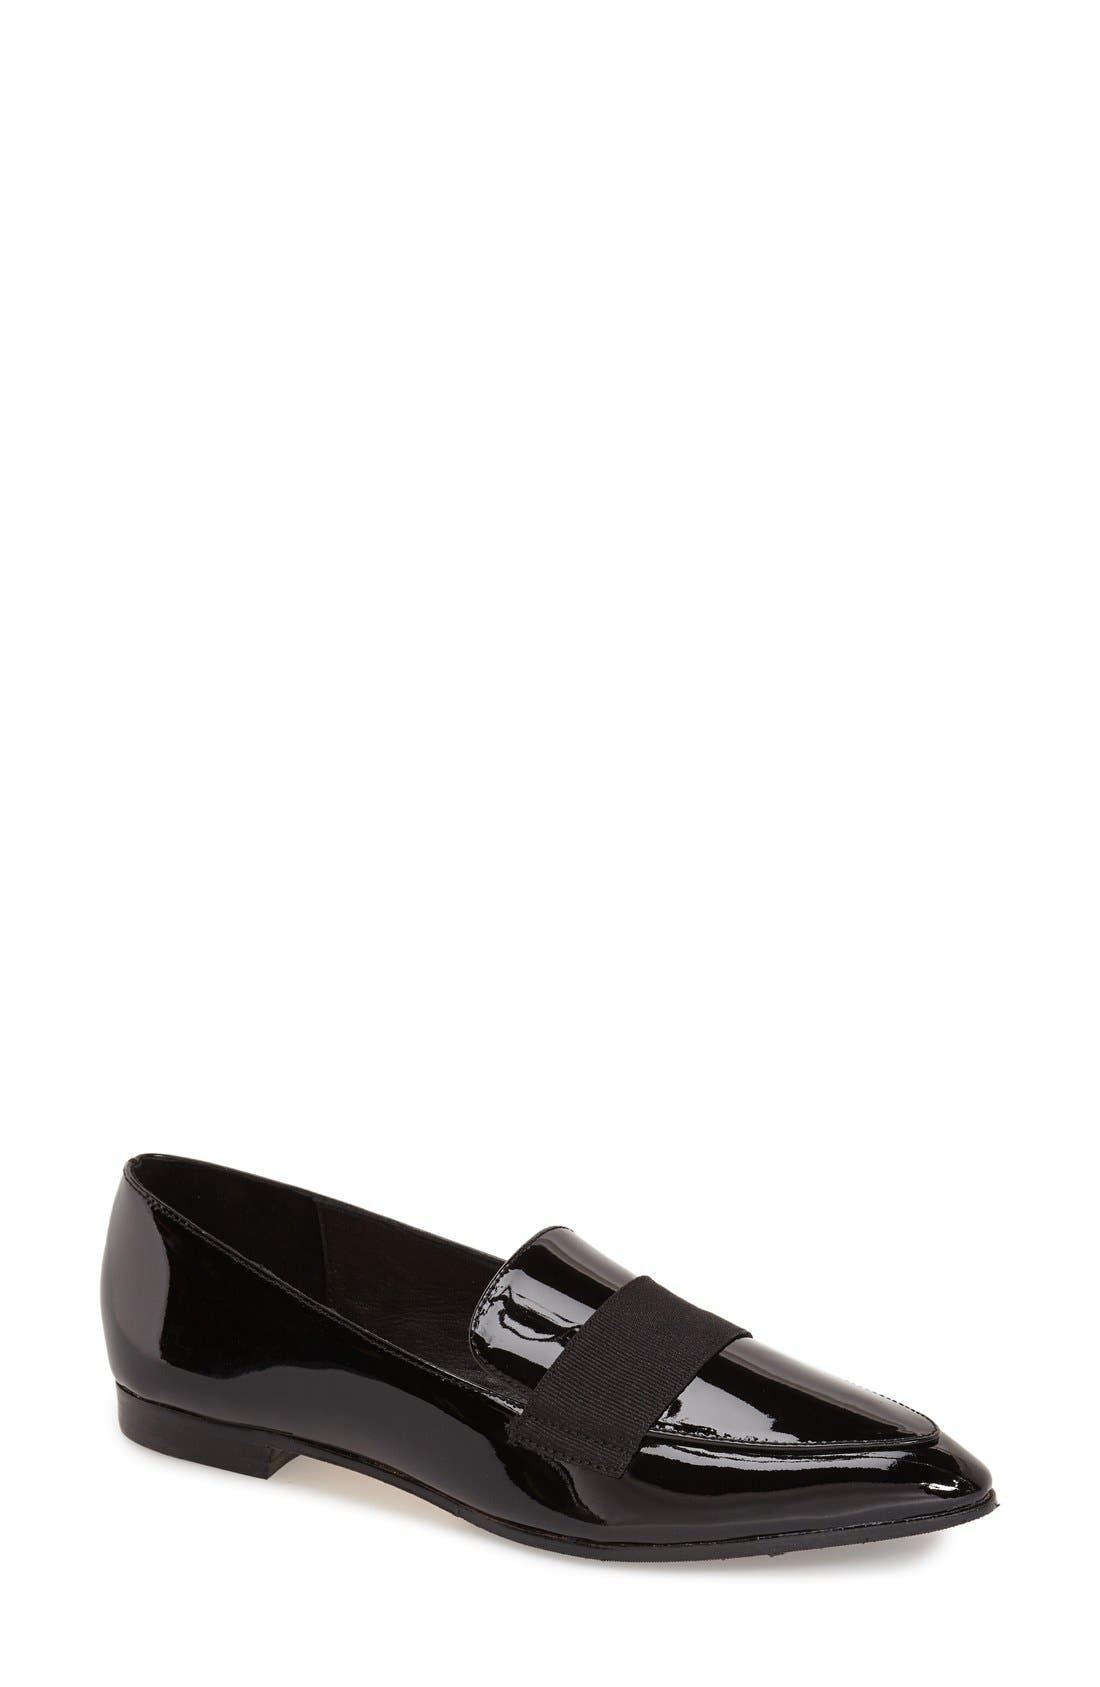 'corina' pointy toe loafer,                             Main thumbnail 1, color,                             001